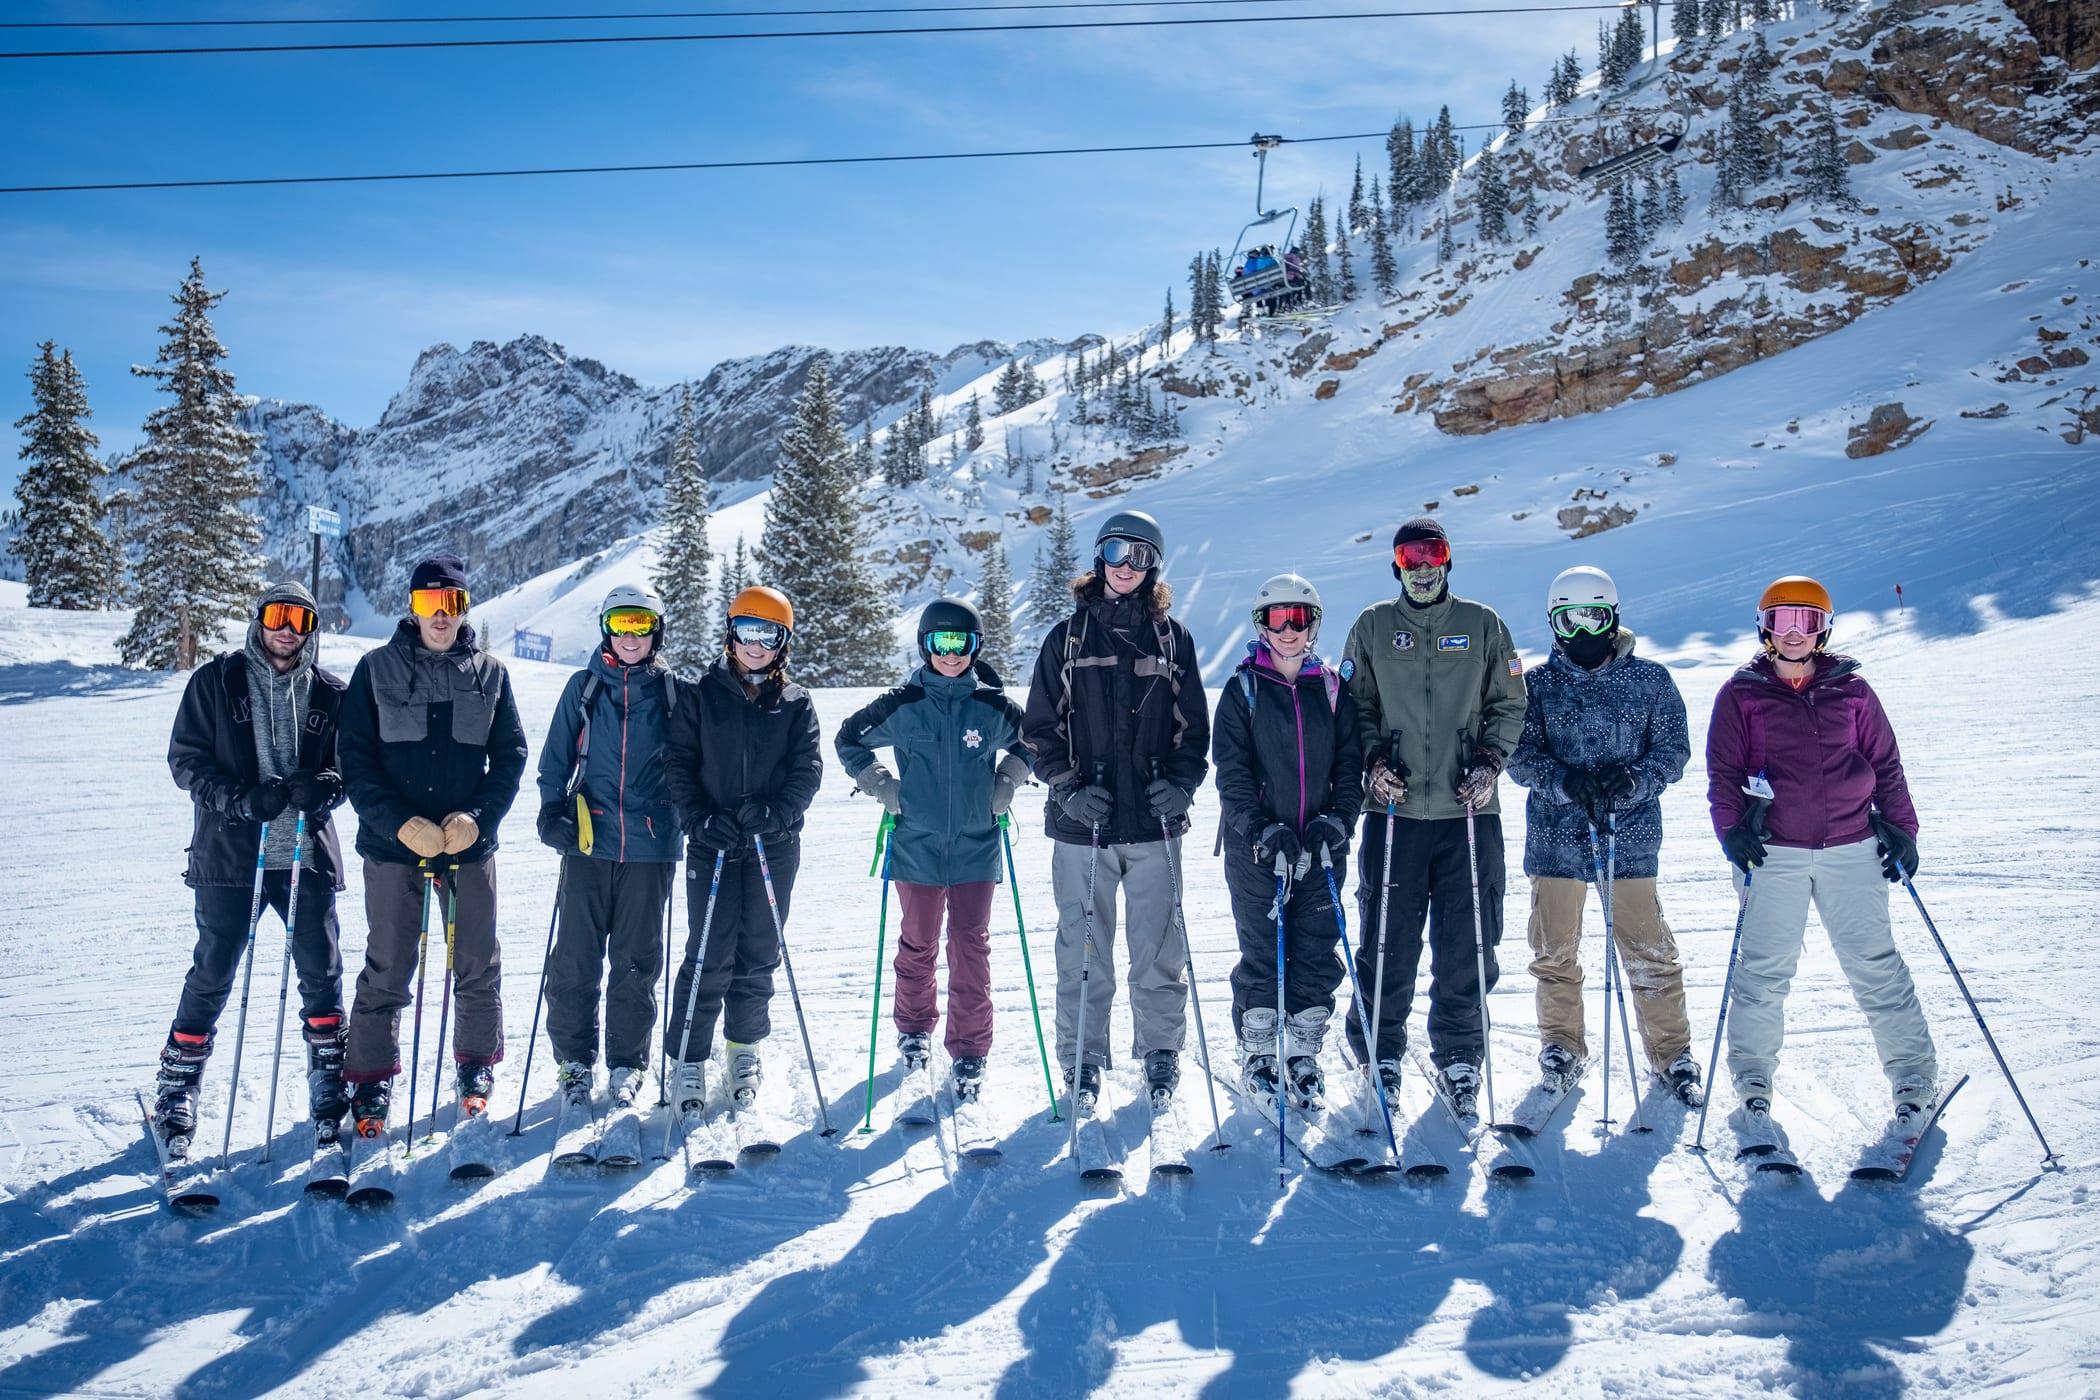 University of Utah students visit Alta Ski Area